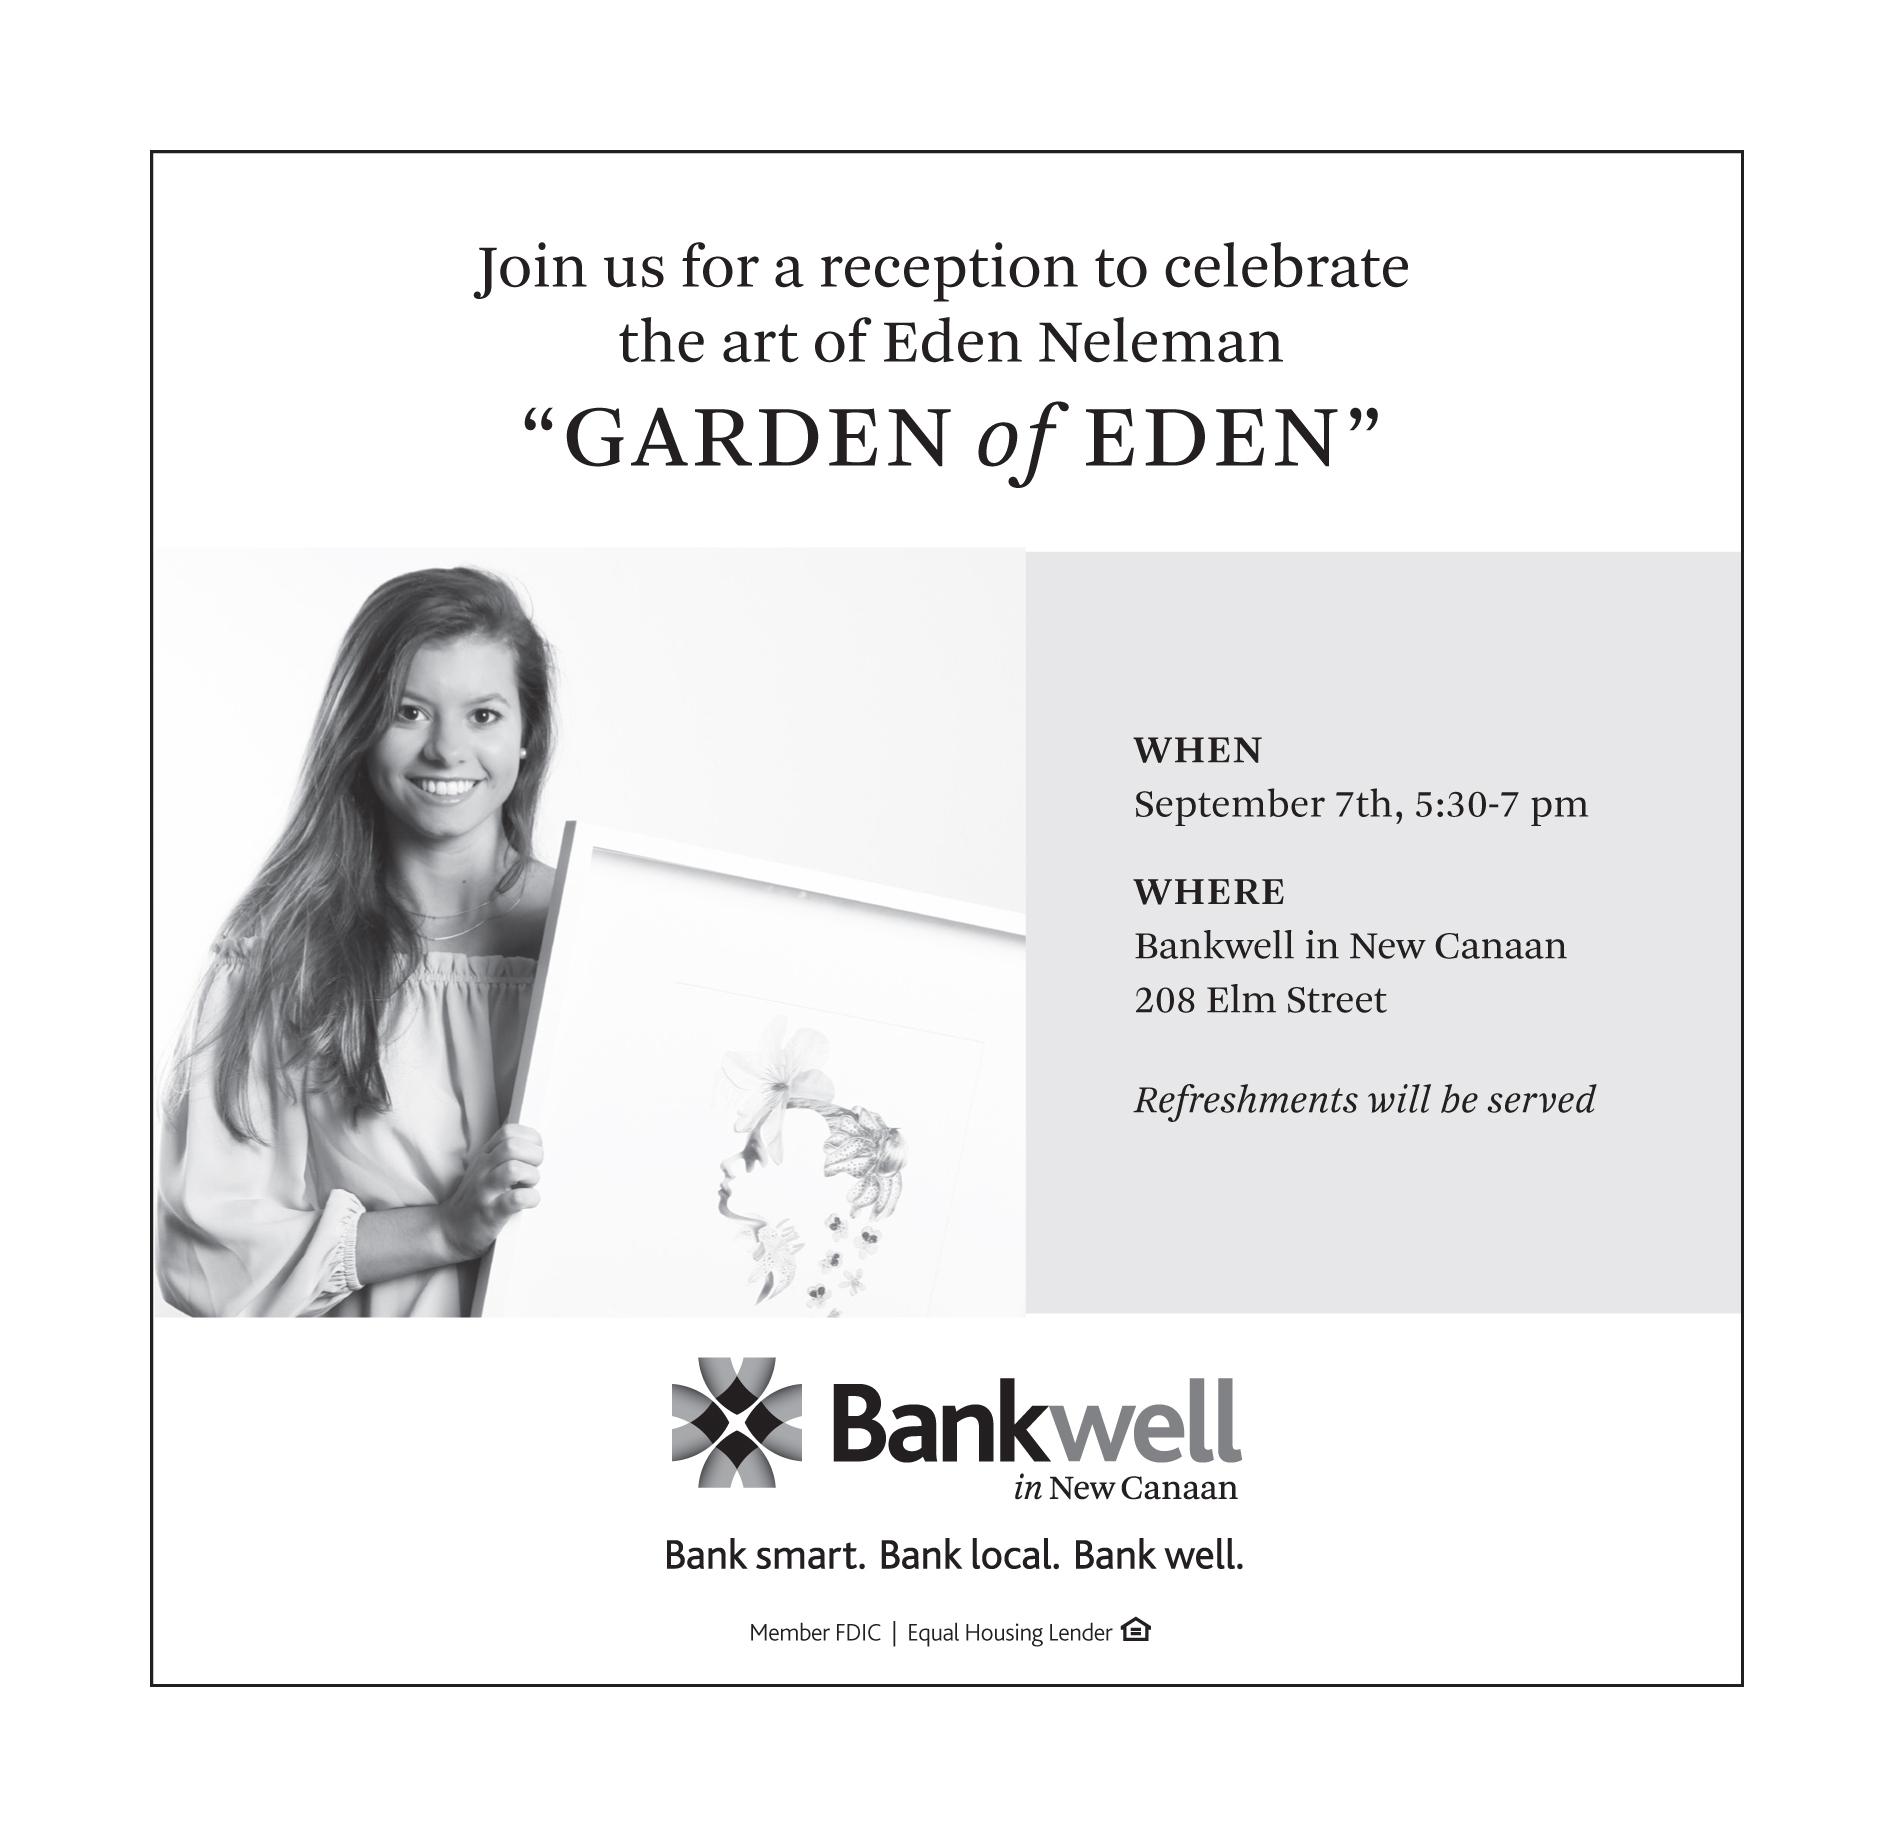 Bankwell_EdenArtist_53125x5123_NC_bw_082216-1.jpg